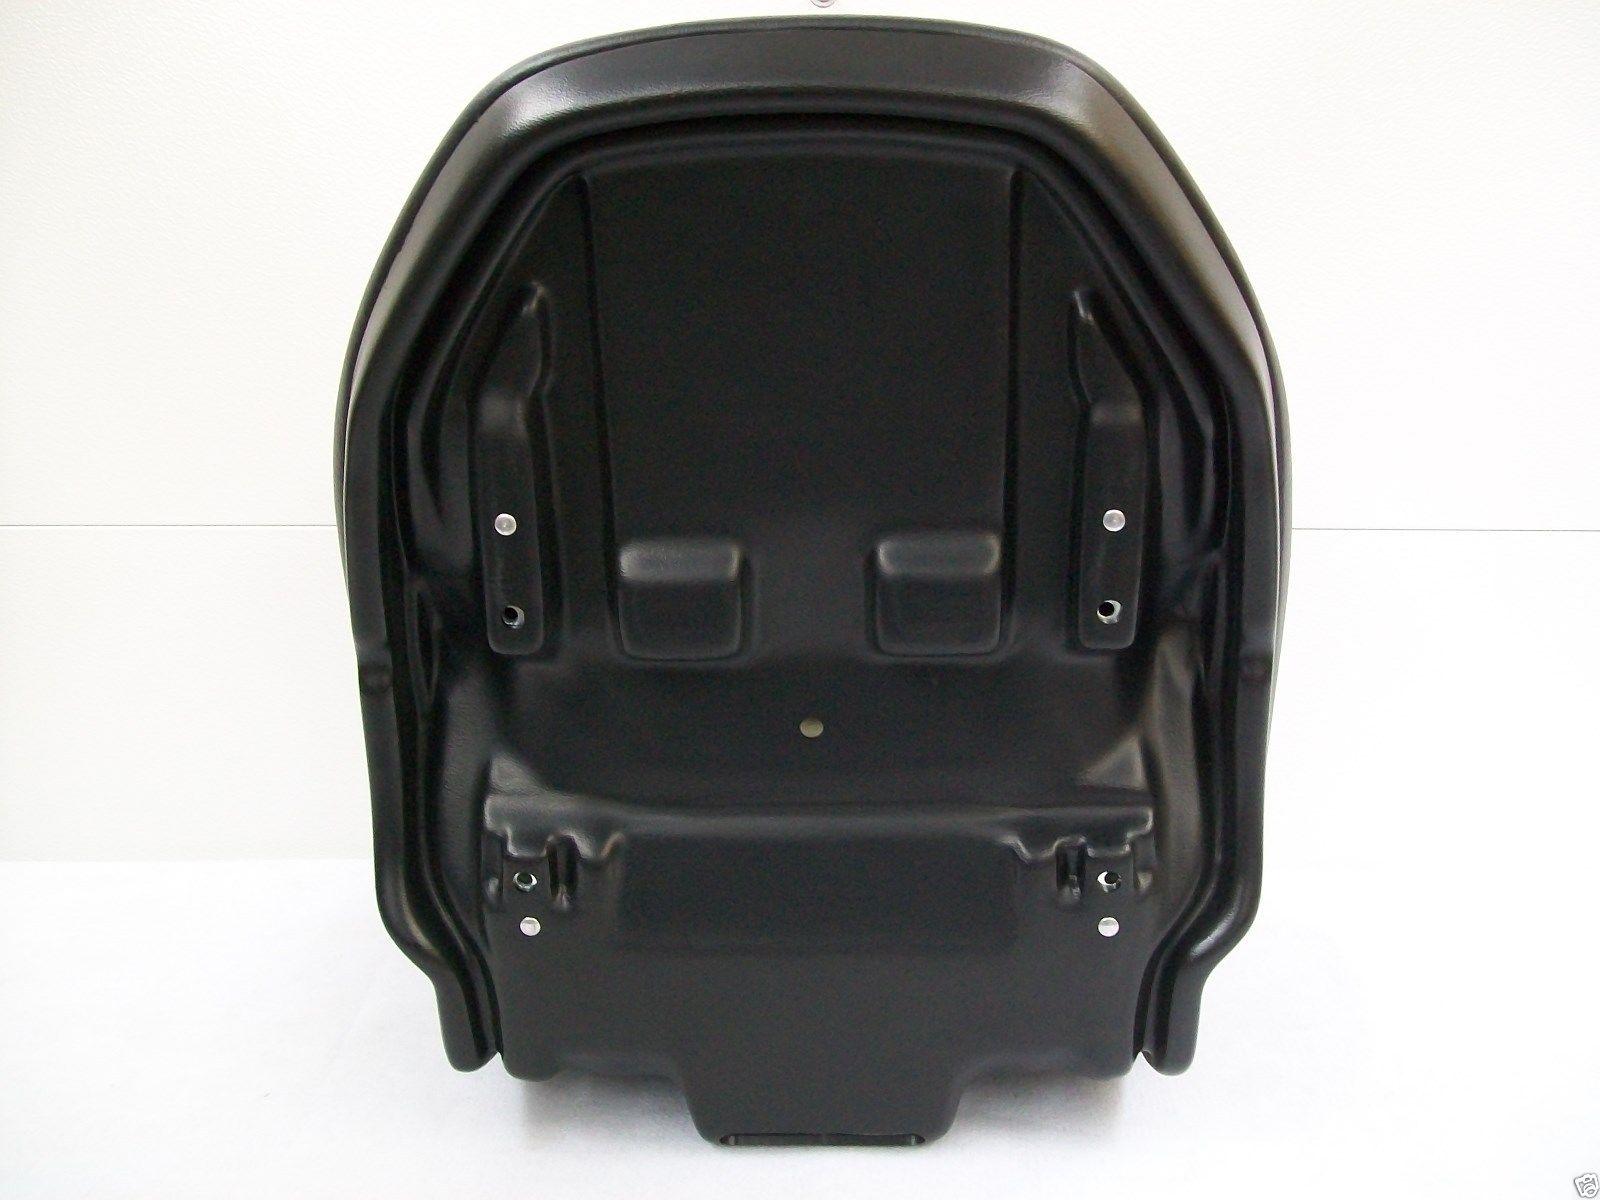 Black Skid Steer Suspension Seat Replacement Cushion Kit for CAT  Caterpillar Models 216B, 226B, 232B, 236B, 242B, 248B, 252B, 257B, 262B,  246C, 256C,